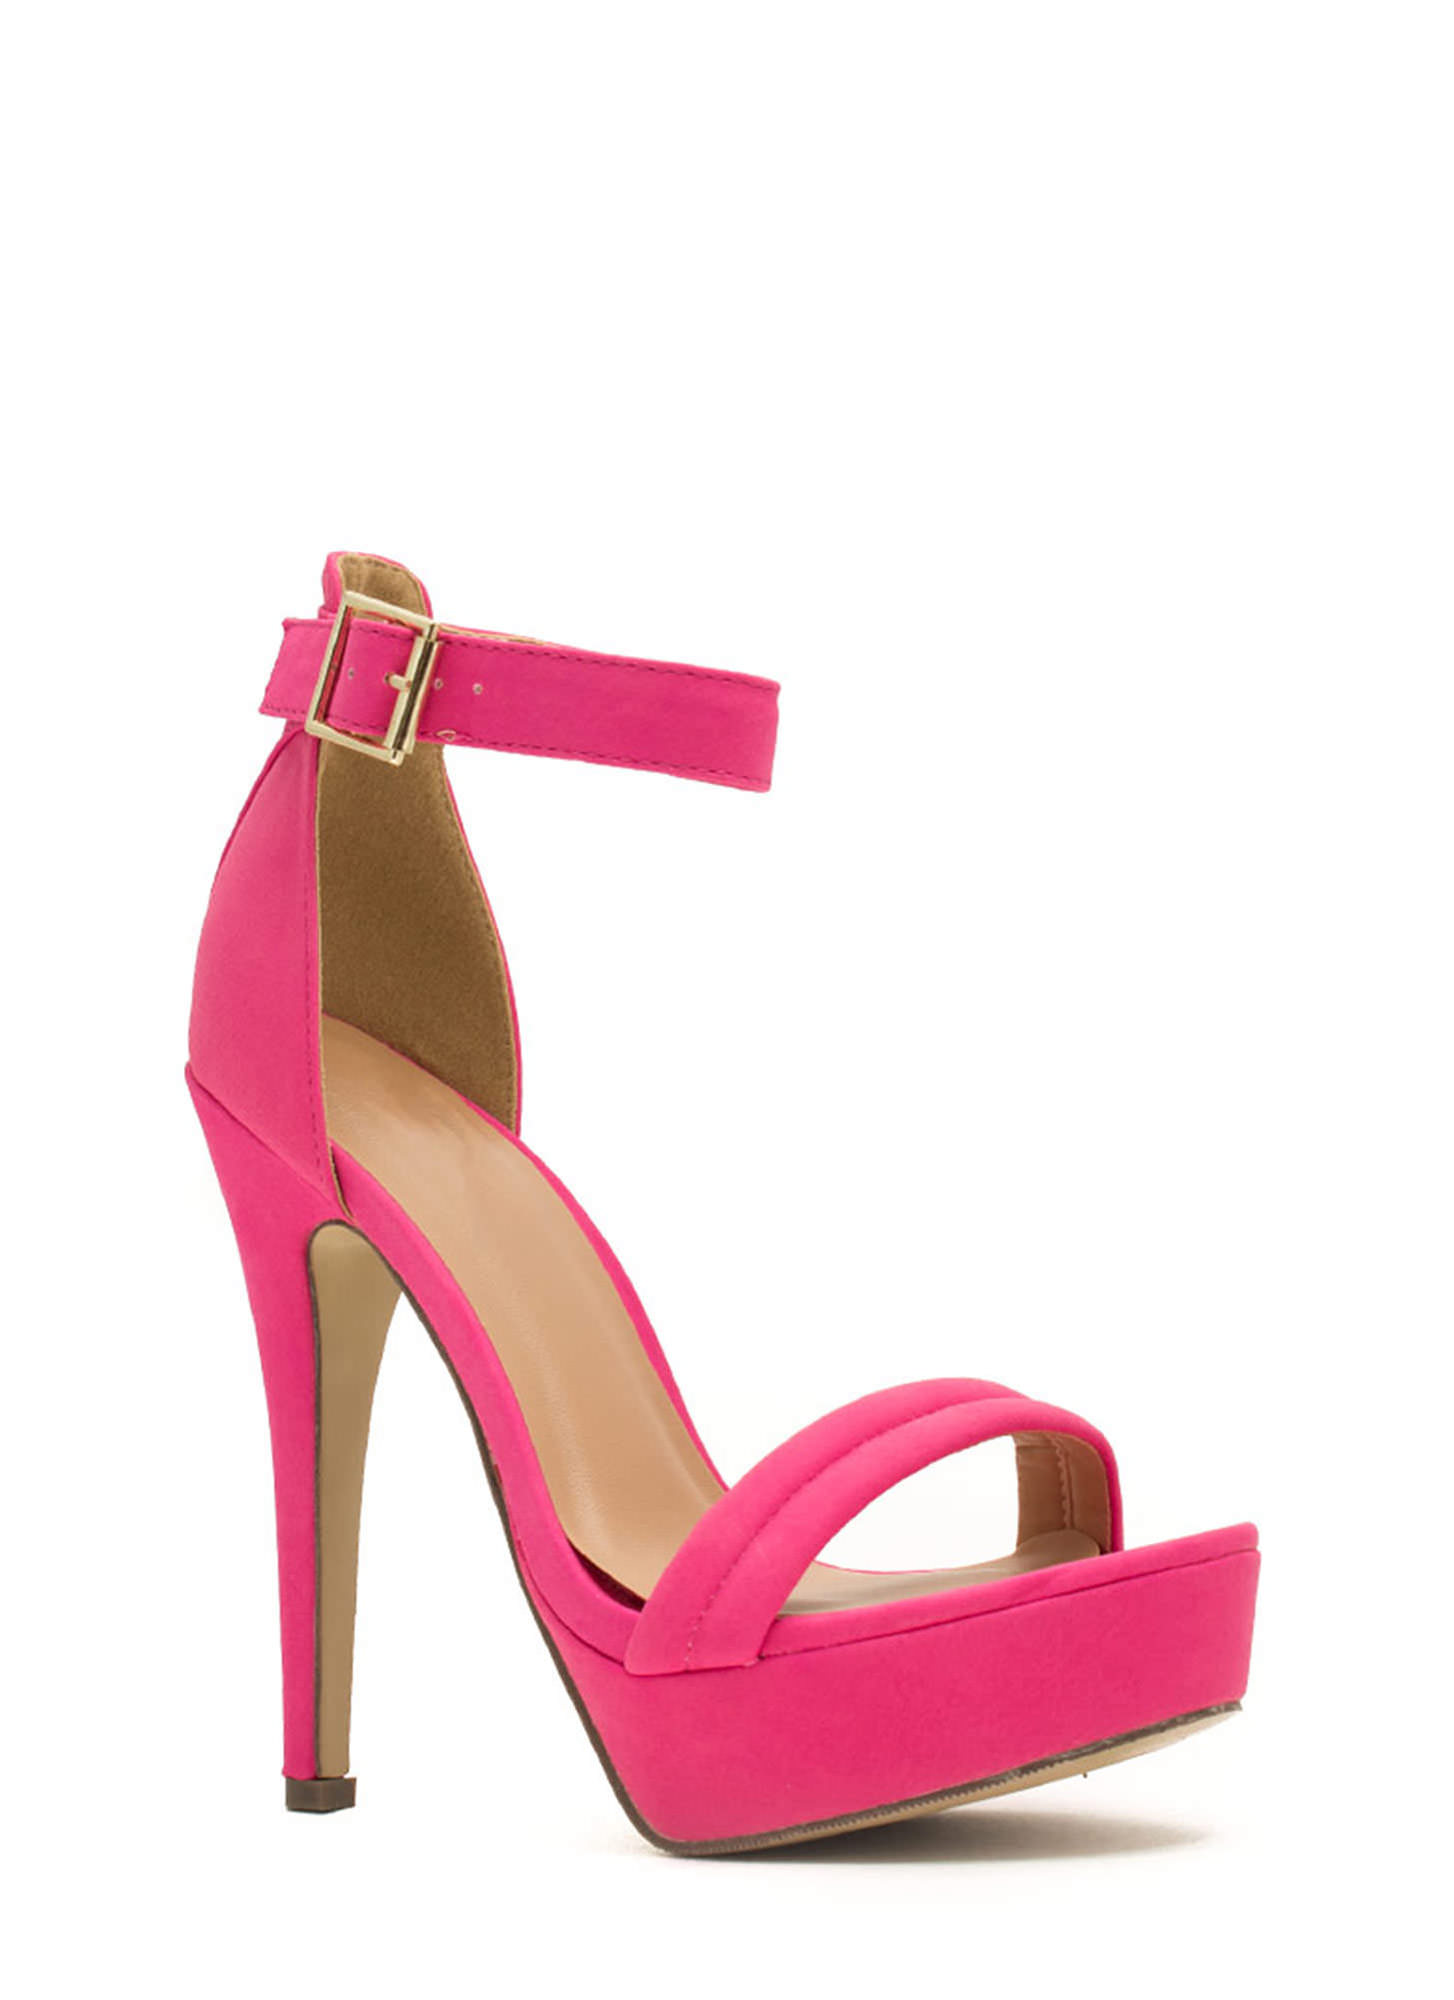 Bright Pink Platform Heels